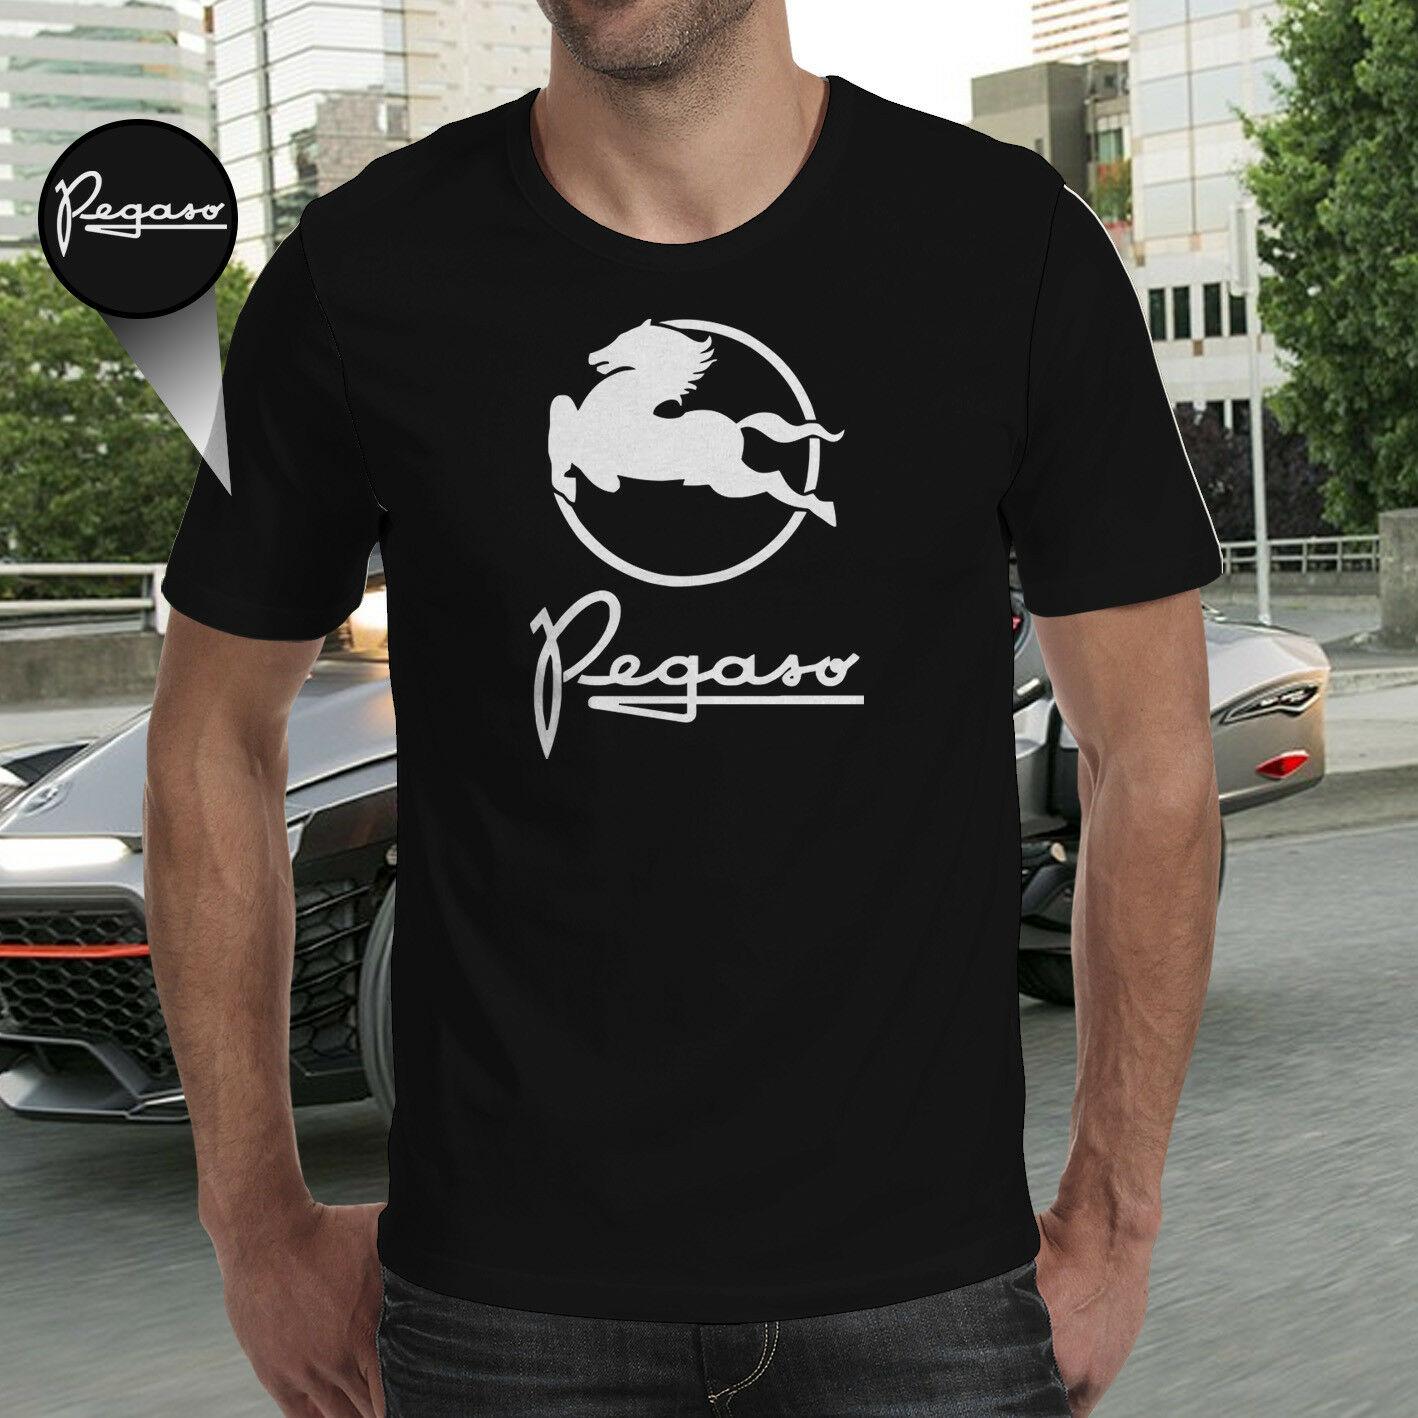 Camicia Chemise Shirt T-shirt Hemd Pegaso Trucks- Show Original Title Long Sleeve Hoddies Unisex Hoddie Short Sleeve Tee Shirt F